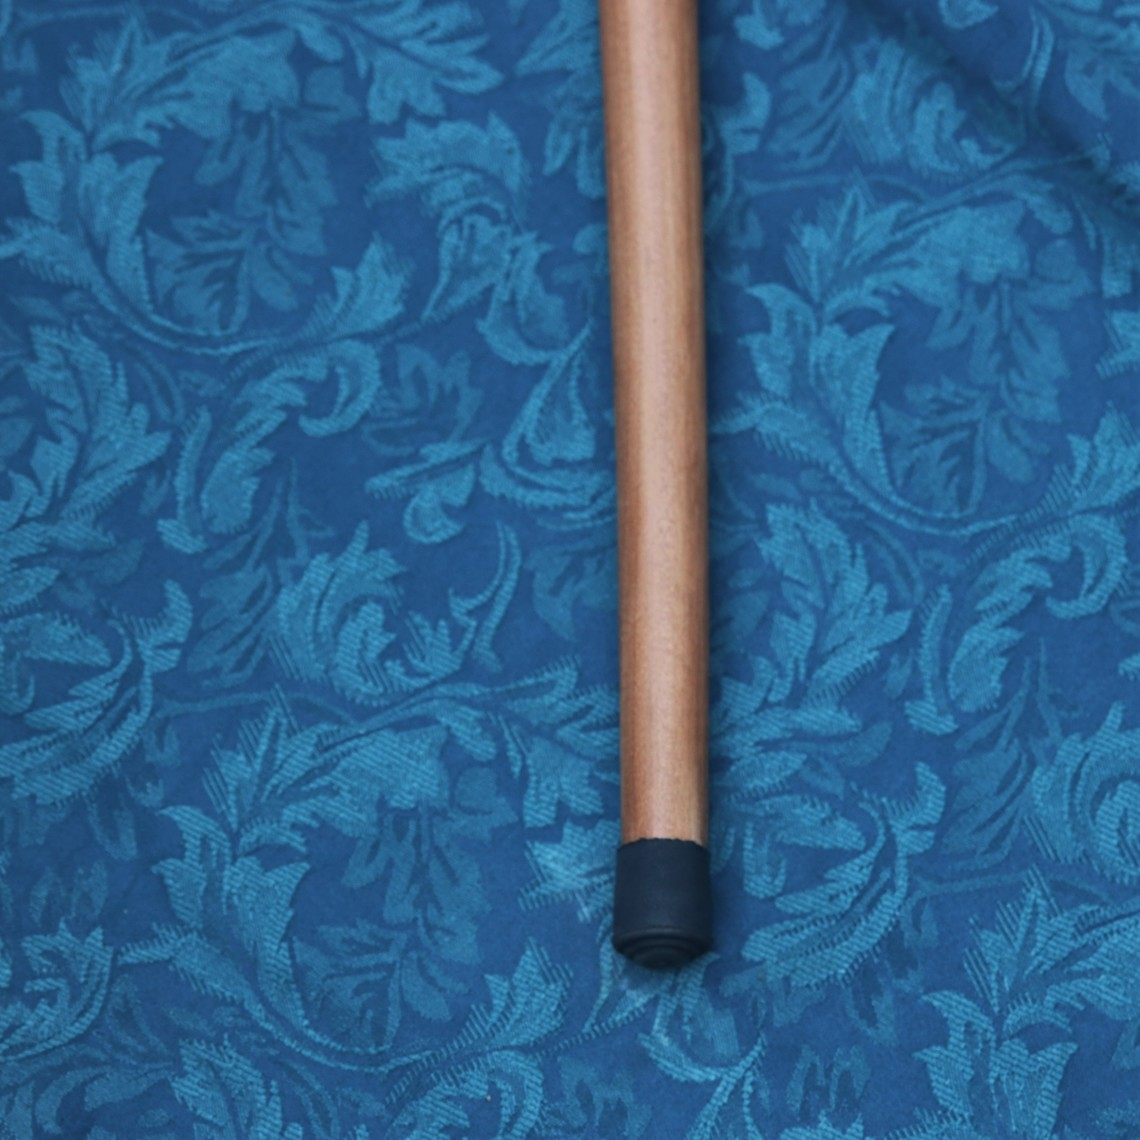 Windlass Steelcrafts bastón de madera con una maza